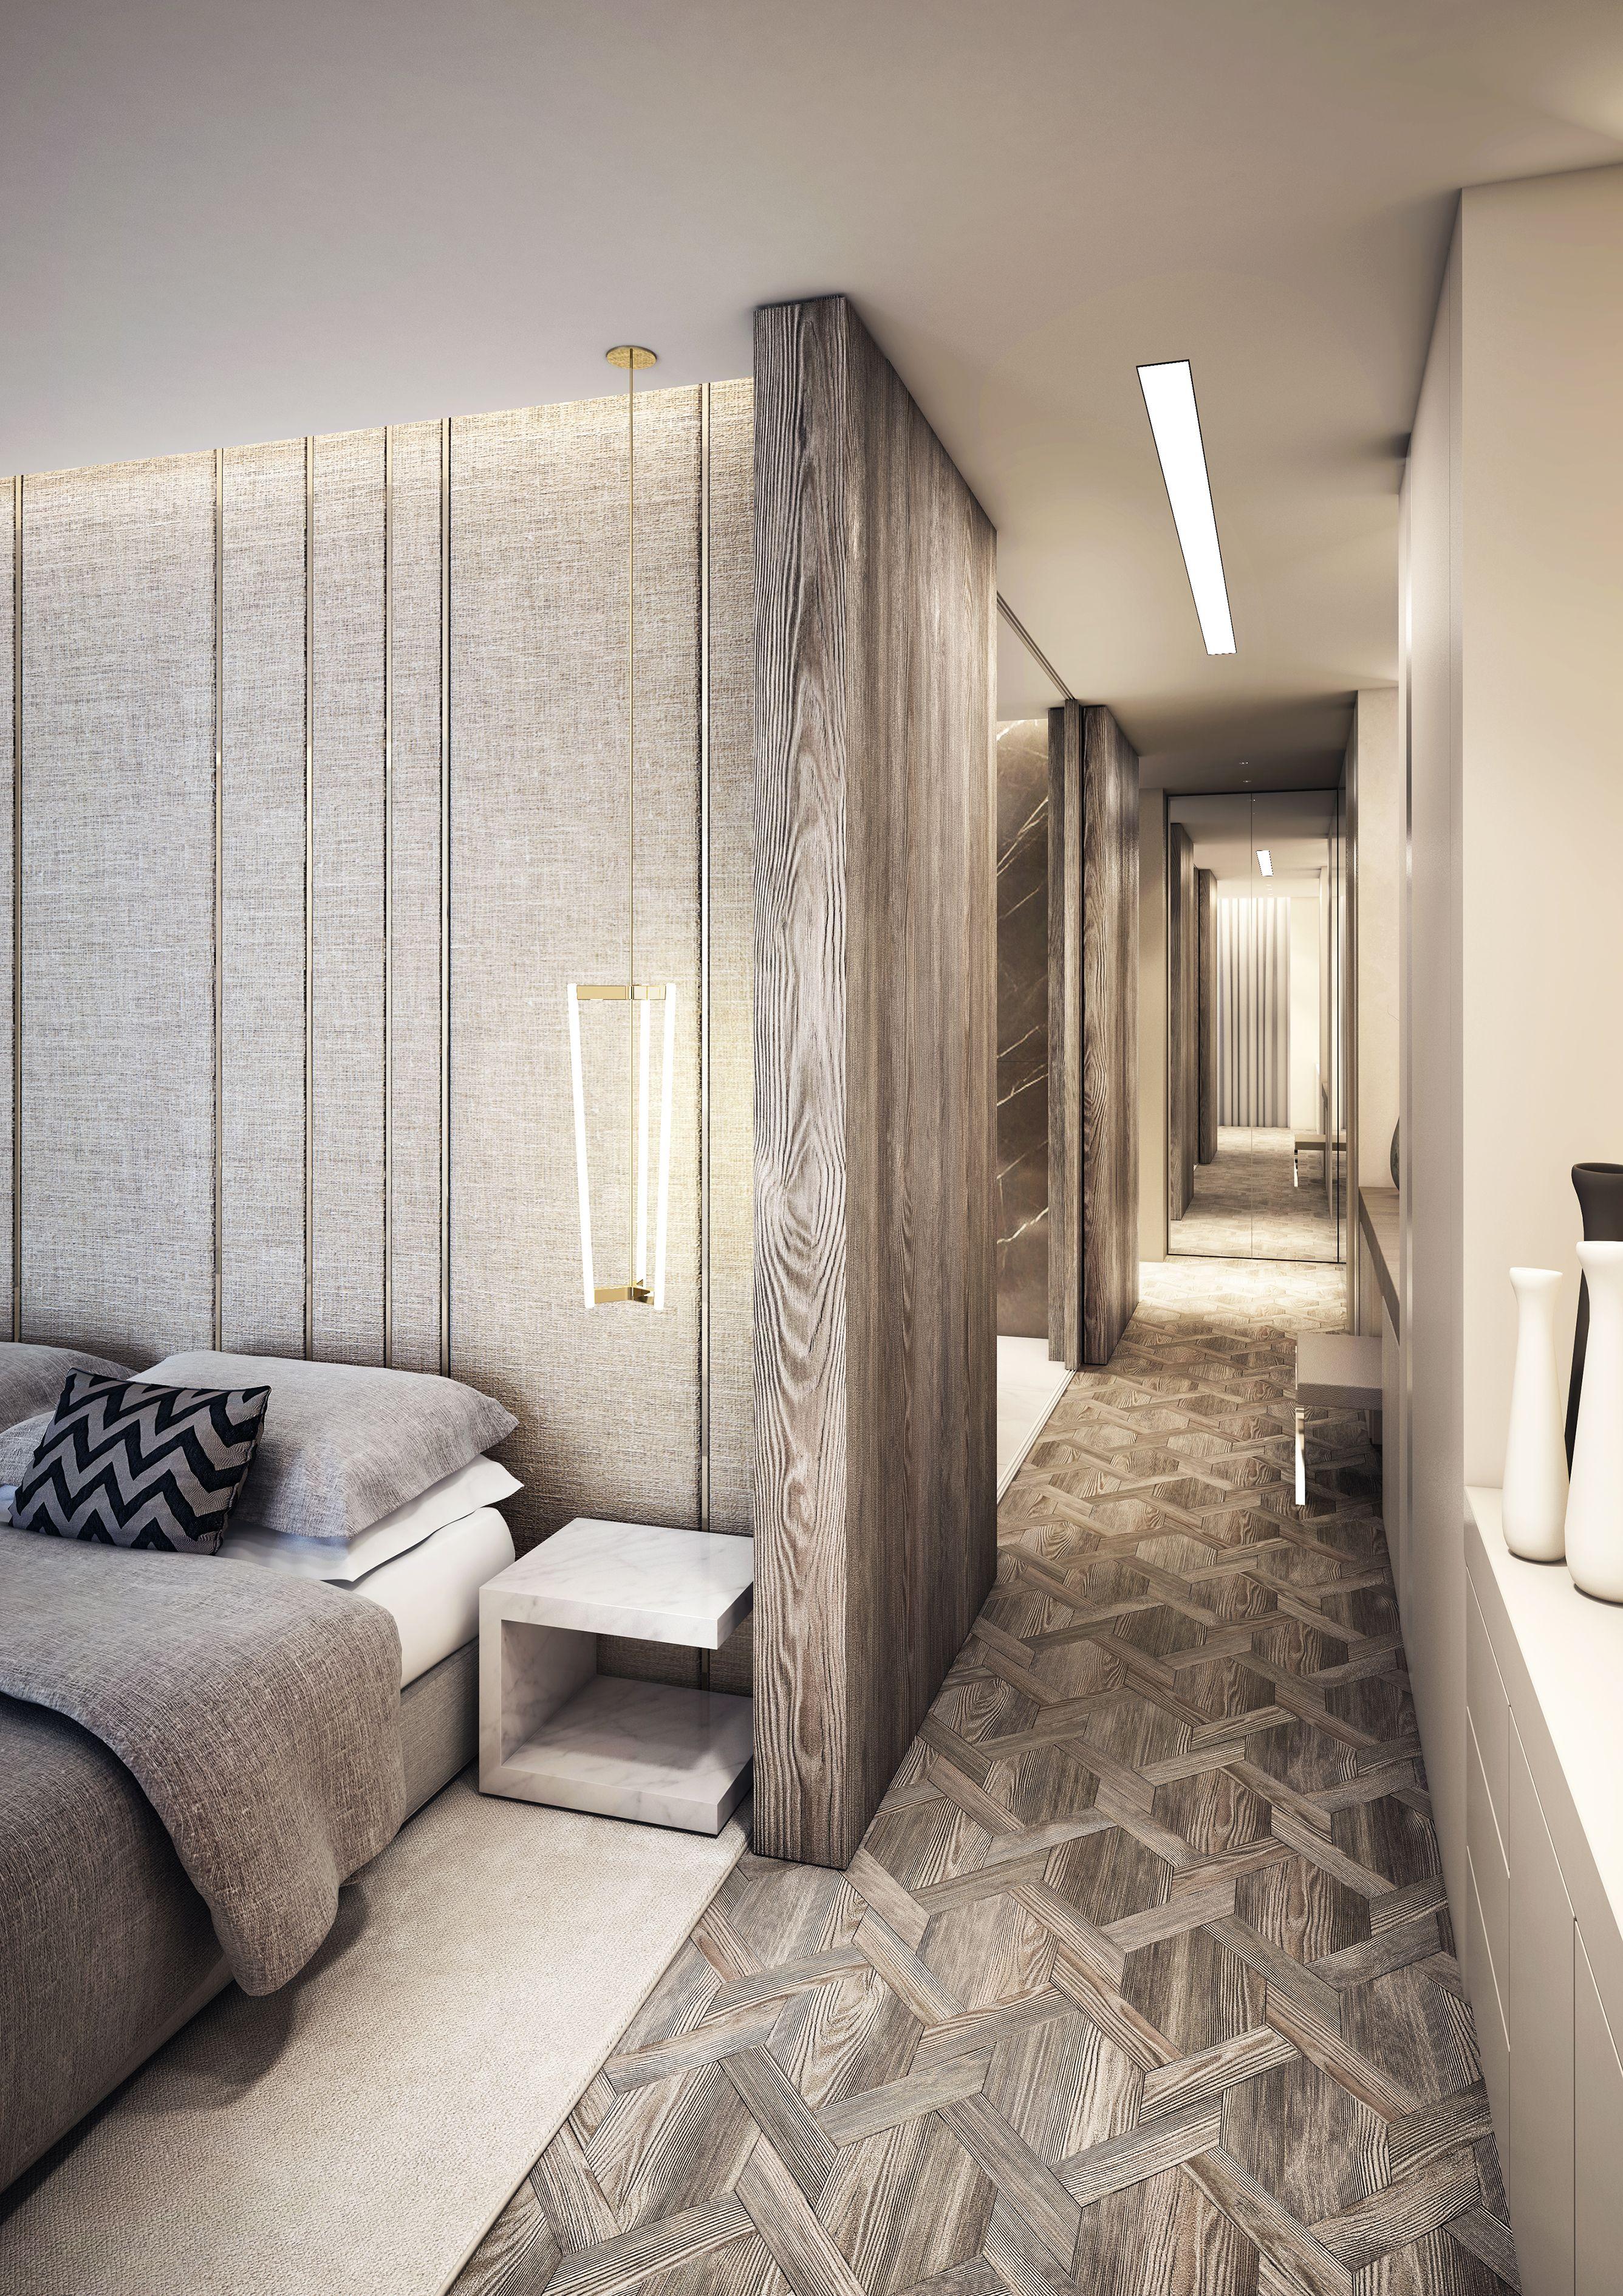 Hotel Room Designs: 08 Project Fitzroy, London, #1508london